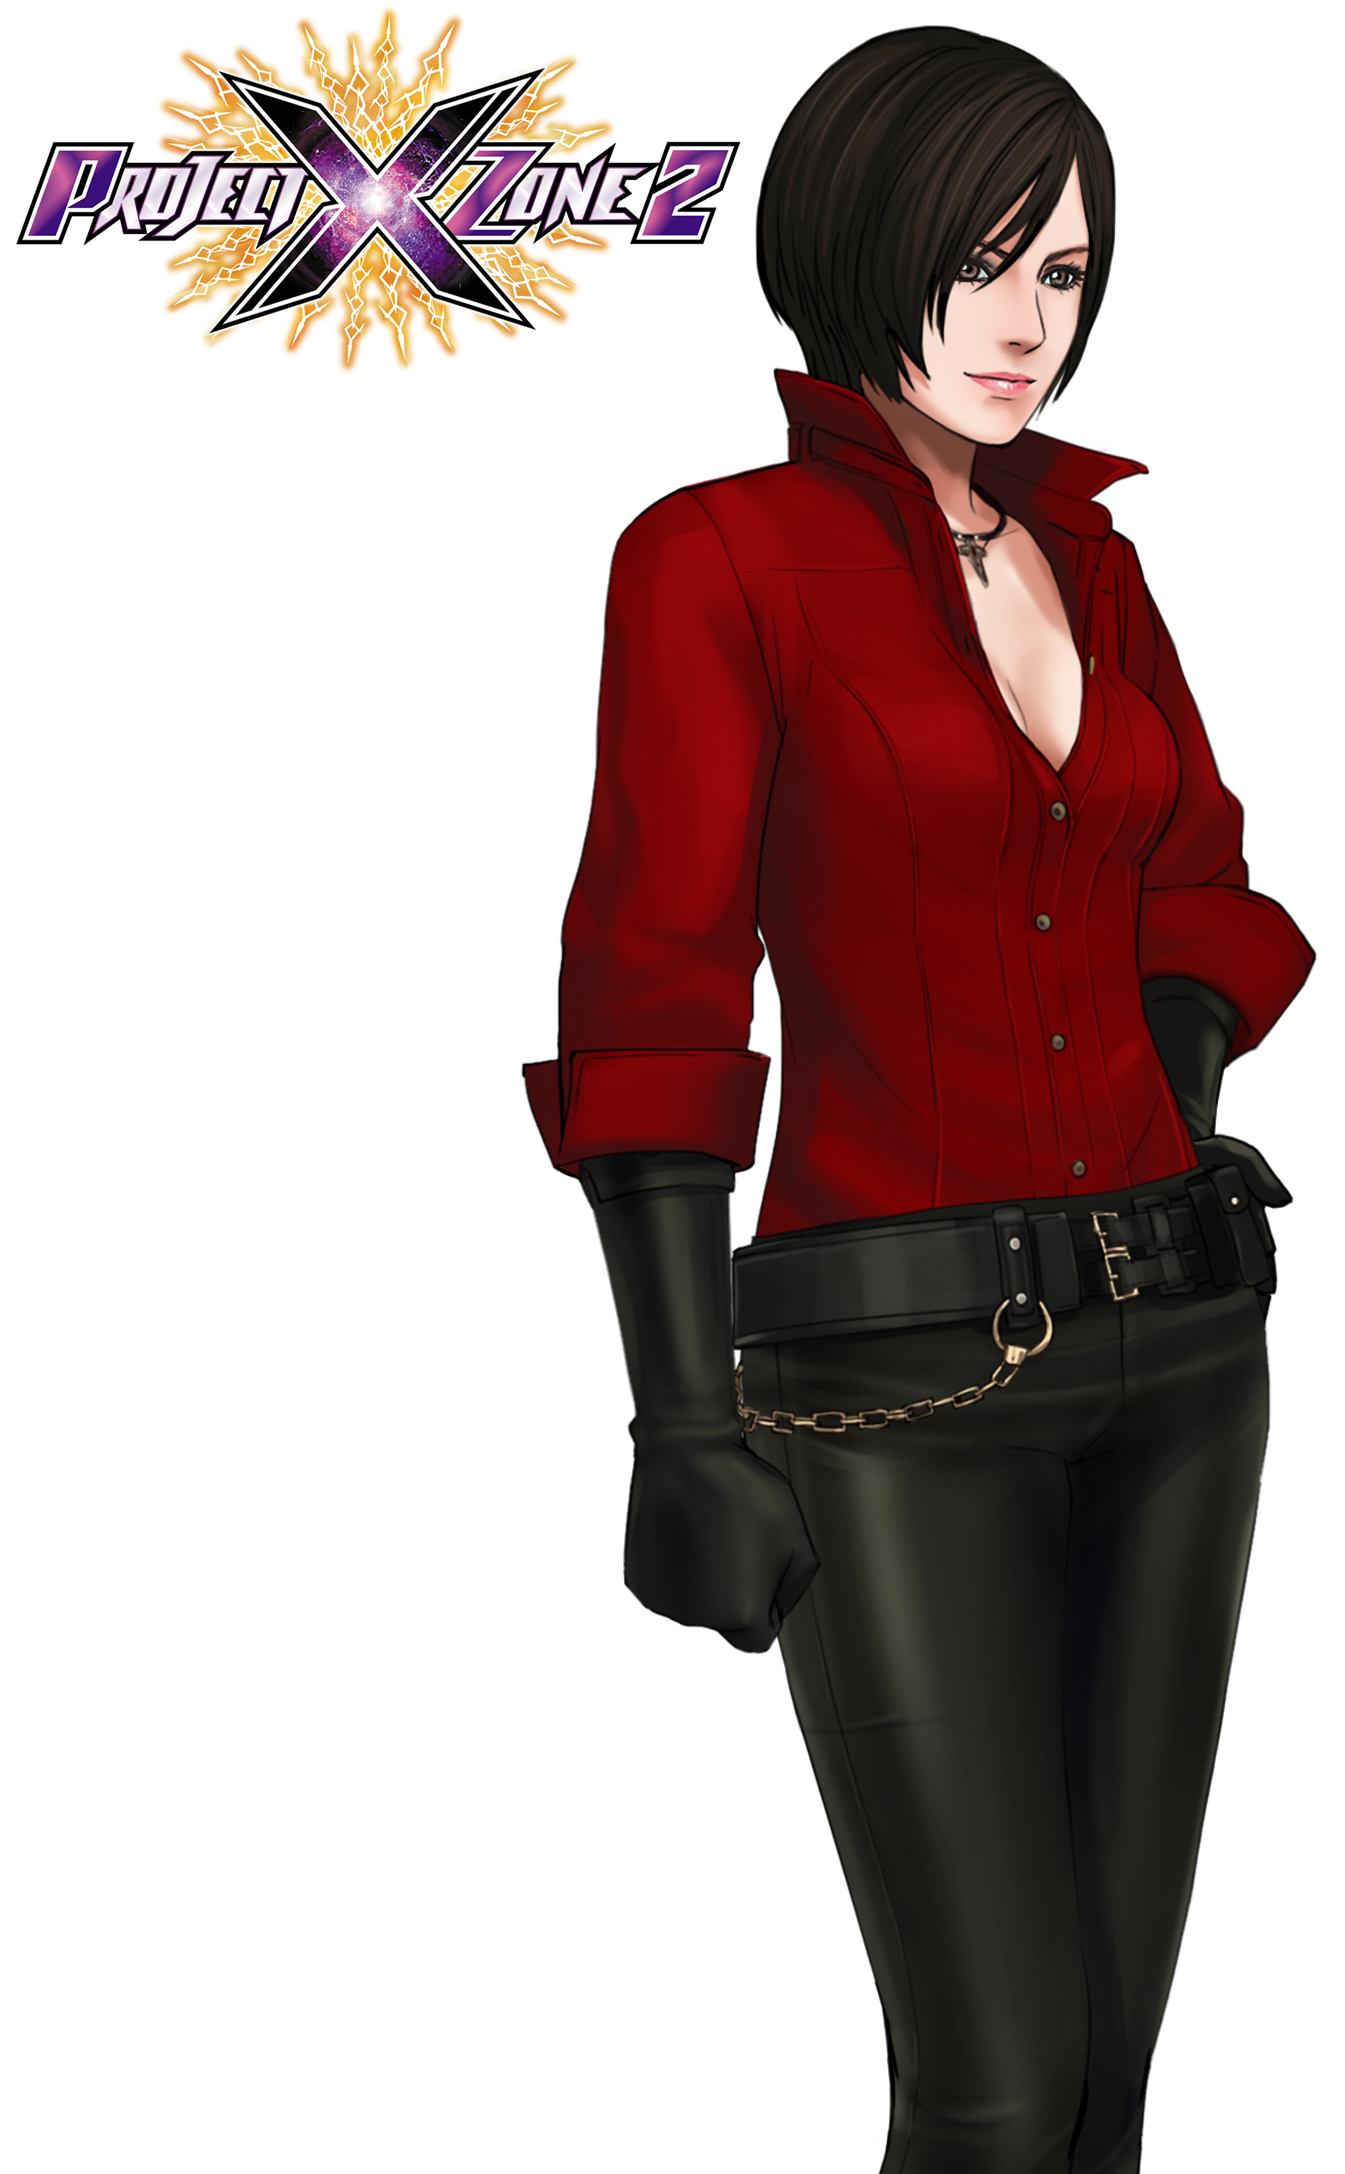 ProjectXZone2-BraveNewWorld 3DS Editeur 123